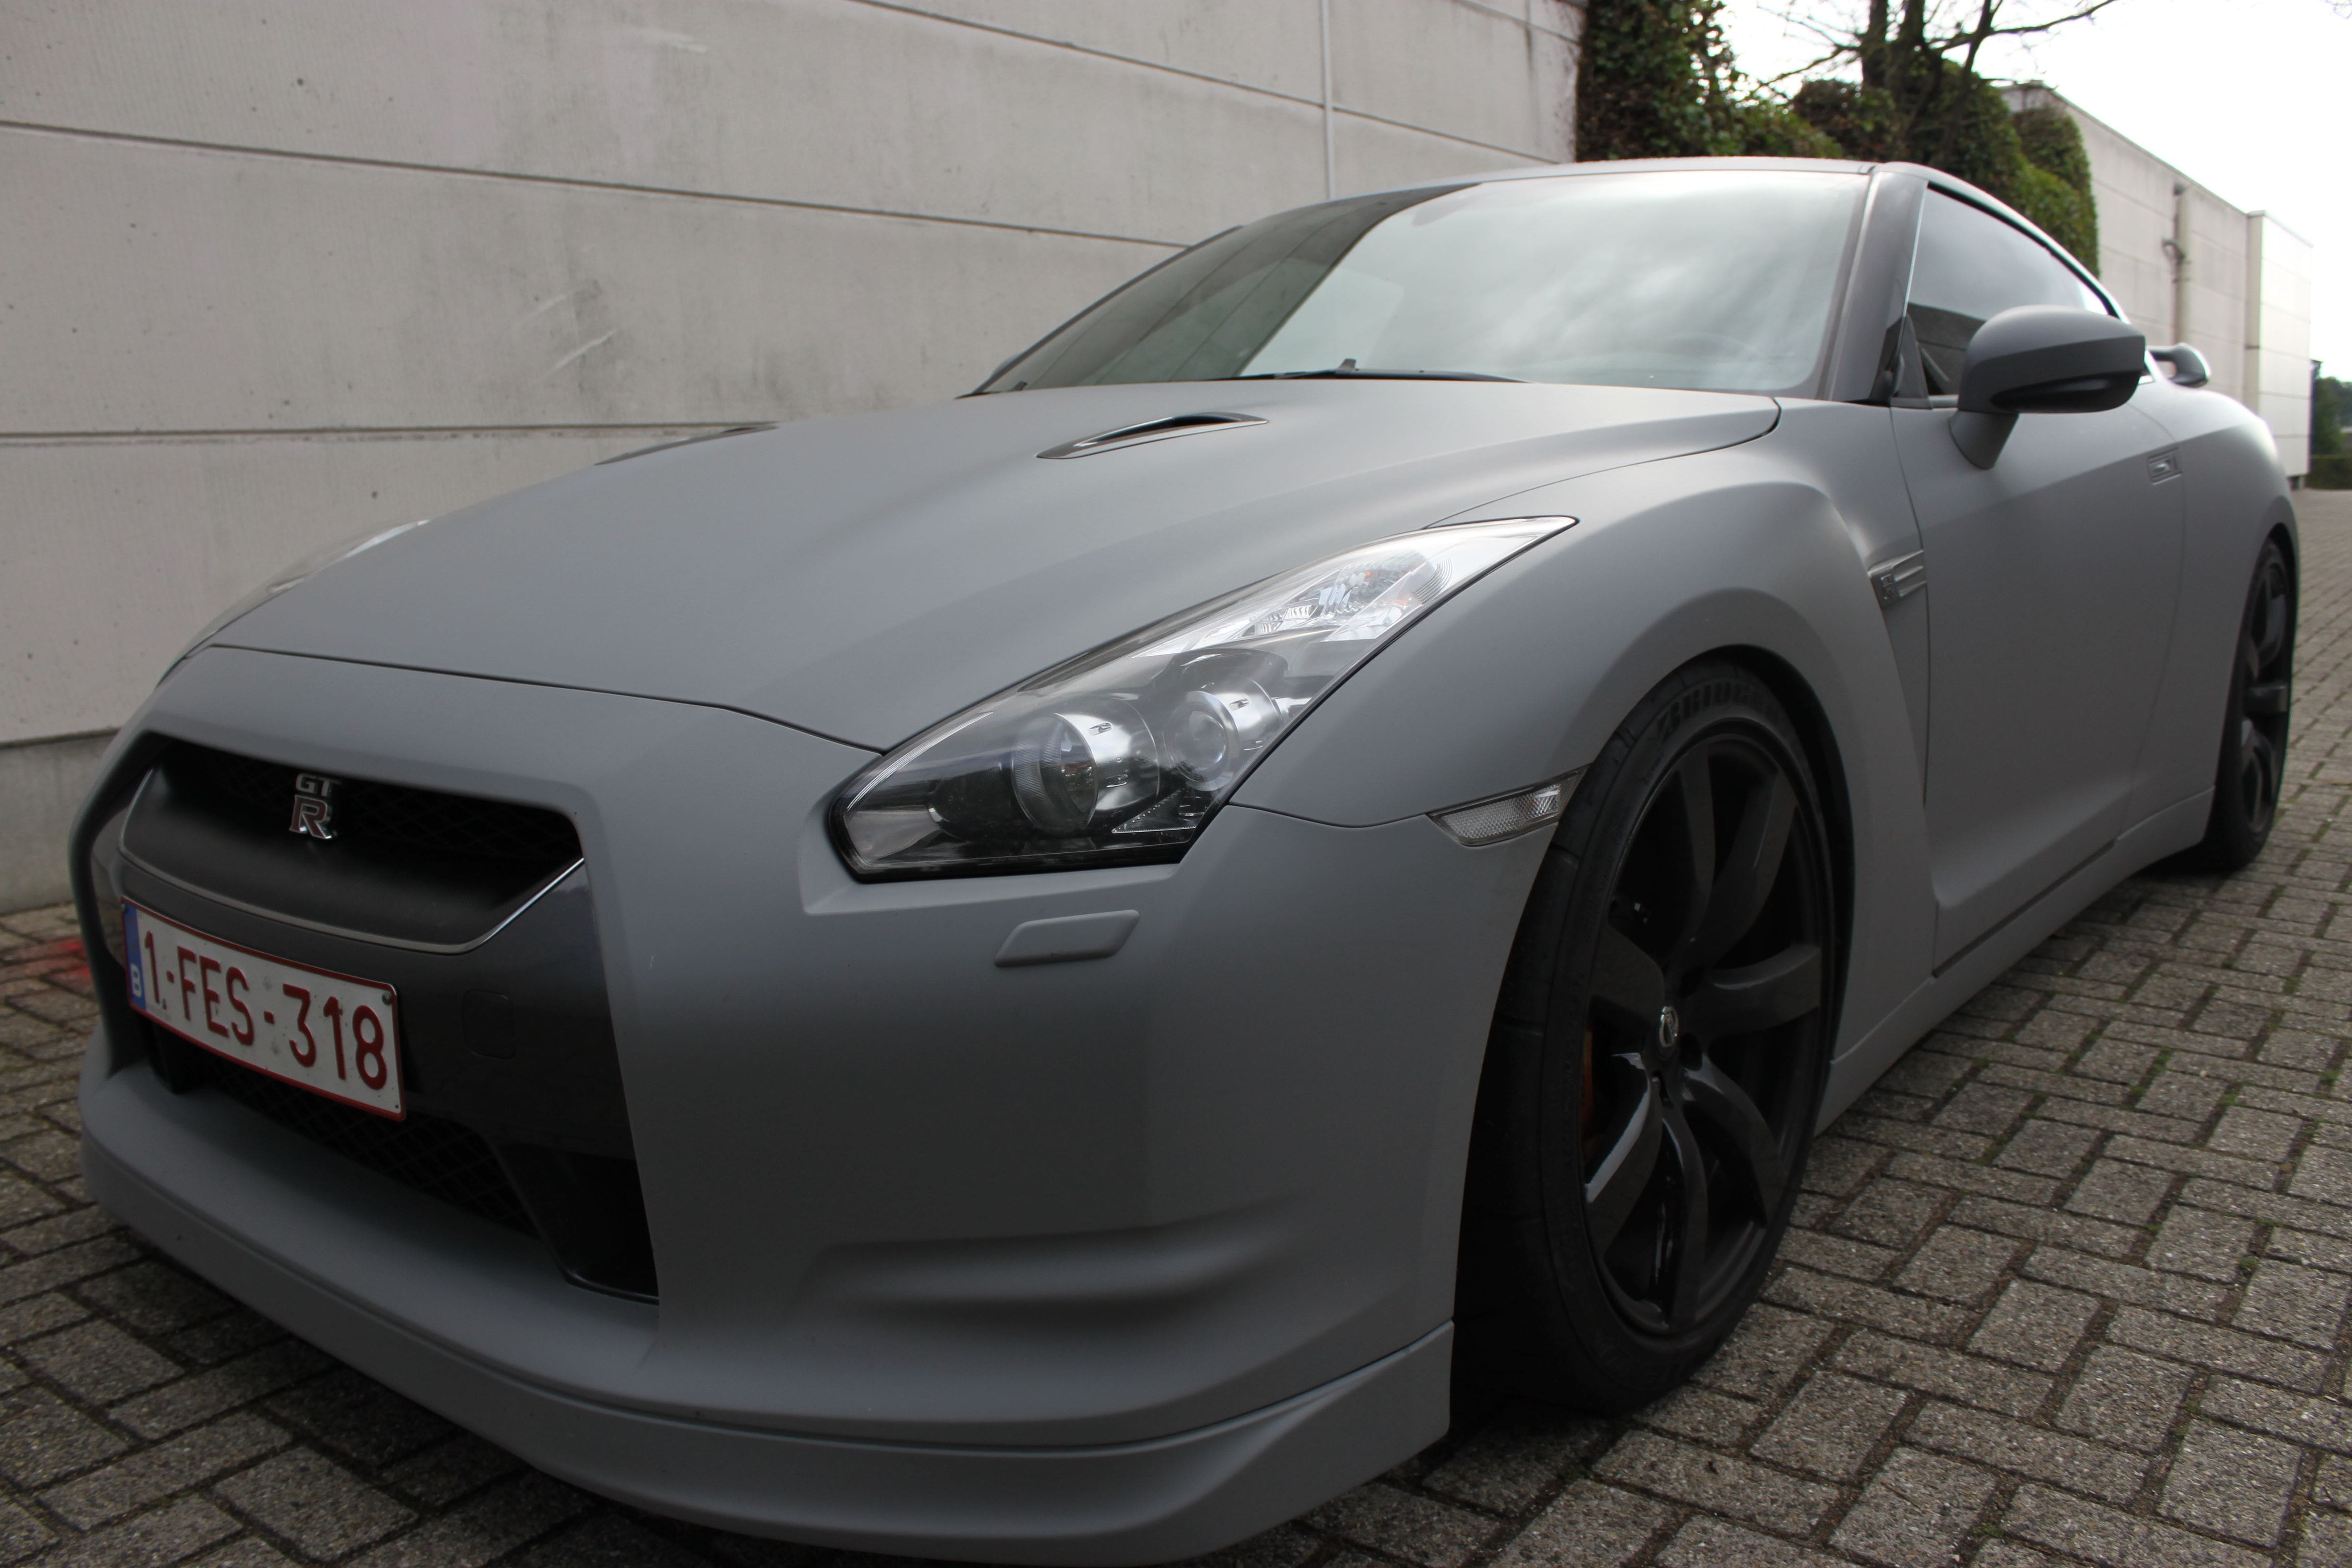 Nissan GT-R met Mat Grijze Wrap, Carwrapping door Wrapmyride.nu Foto-nr:6564, ©2021